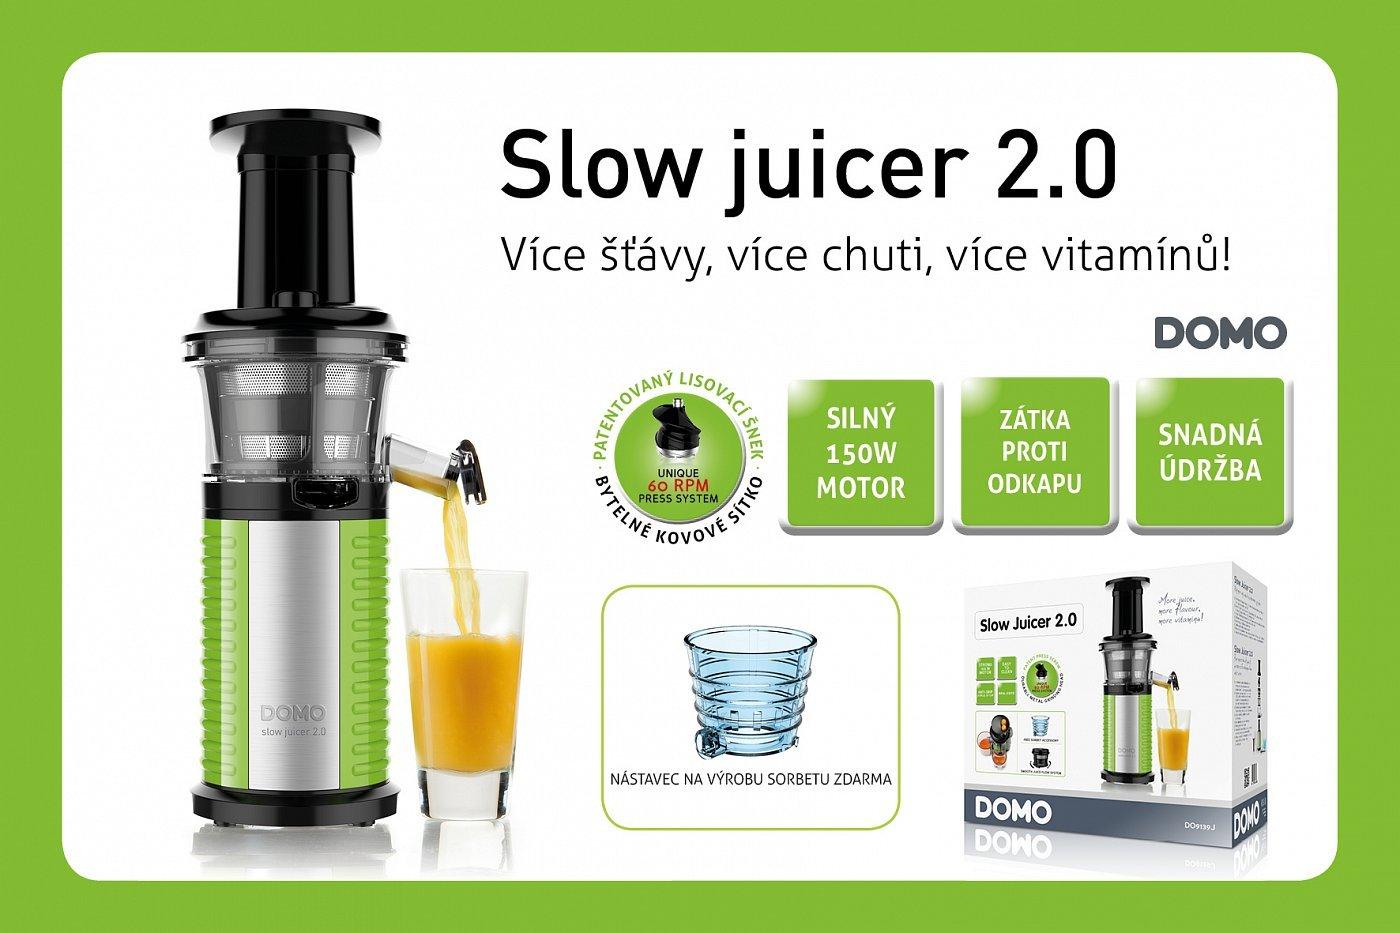 Domo Slow Juicer Review : DOMO DO9139J od??av?ova? Slow Juicer 2.0 Helkon.cz